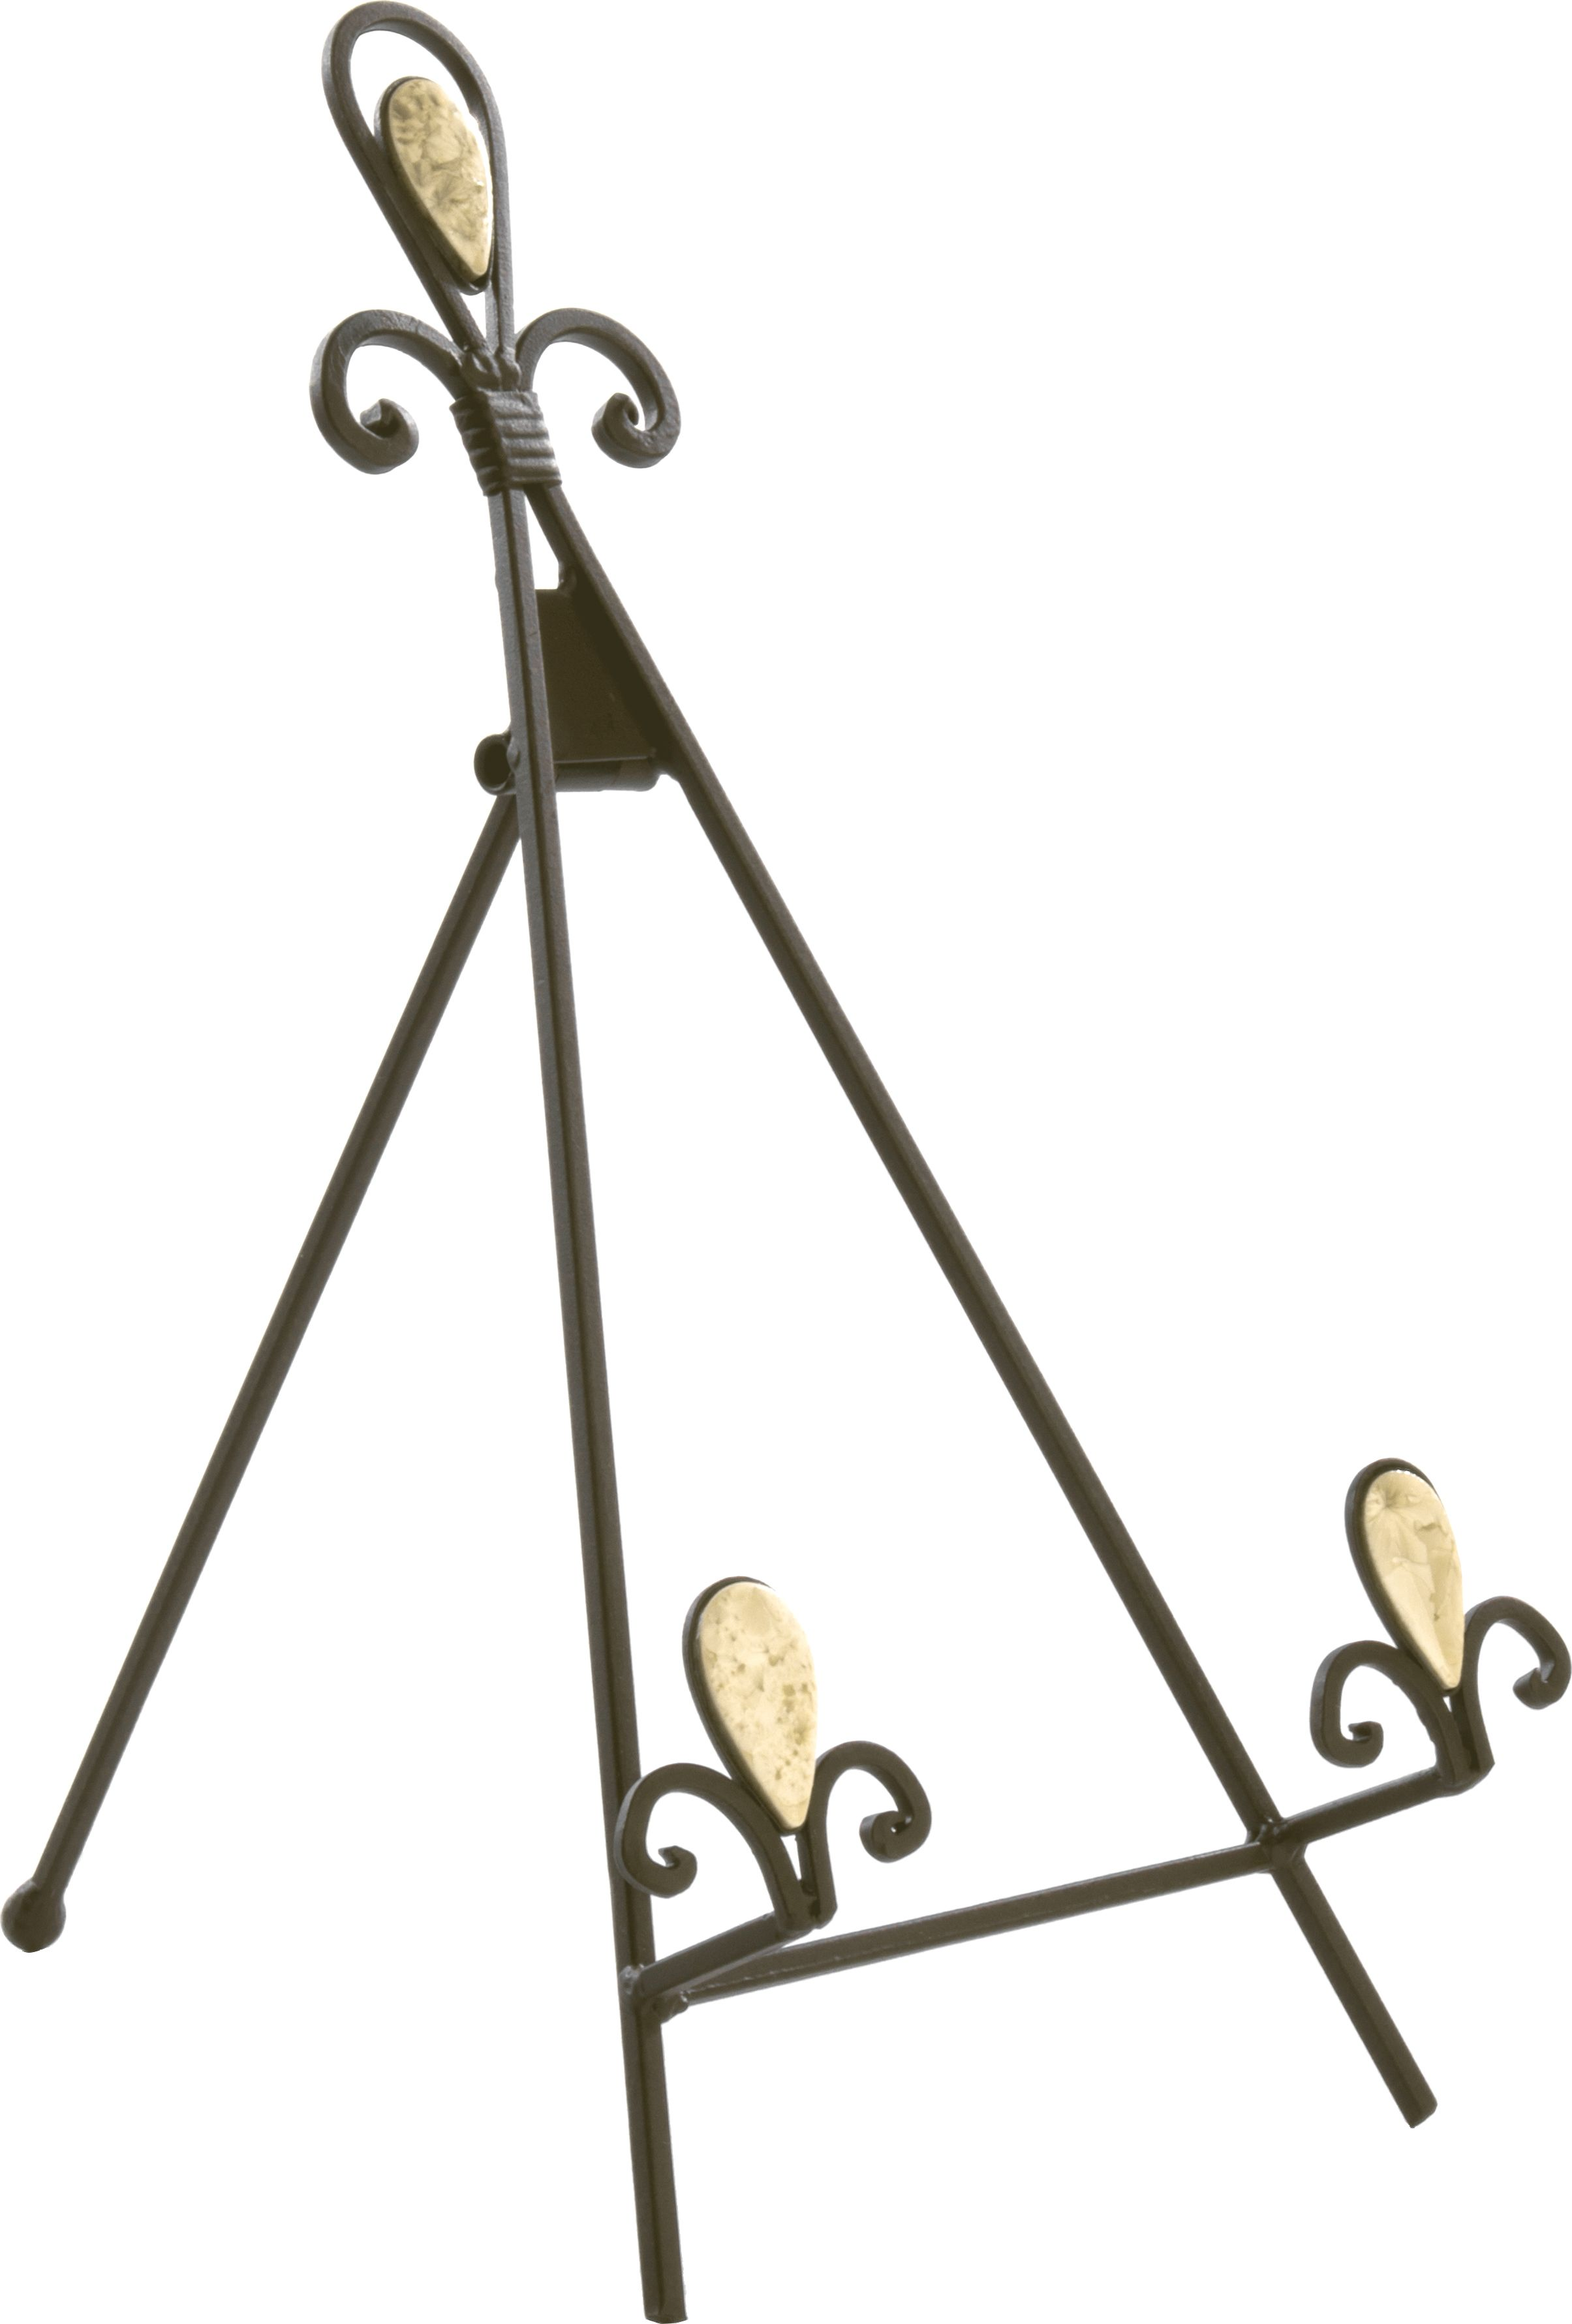 Wrought Iron Table Top Easel Decorative Tripod Design 8